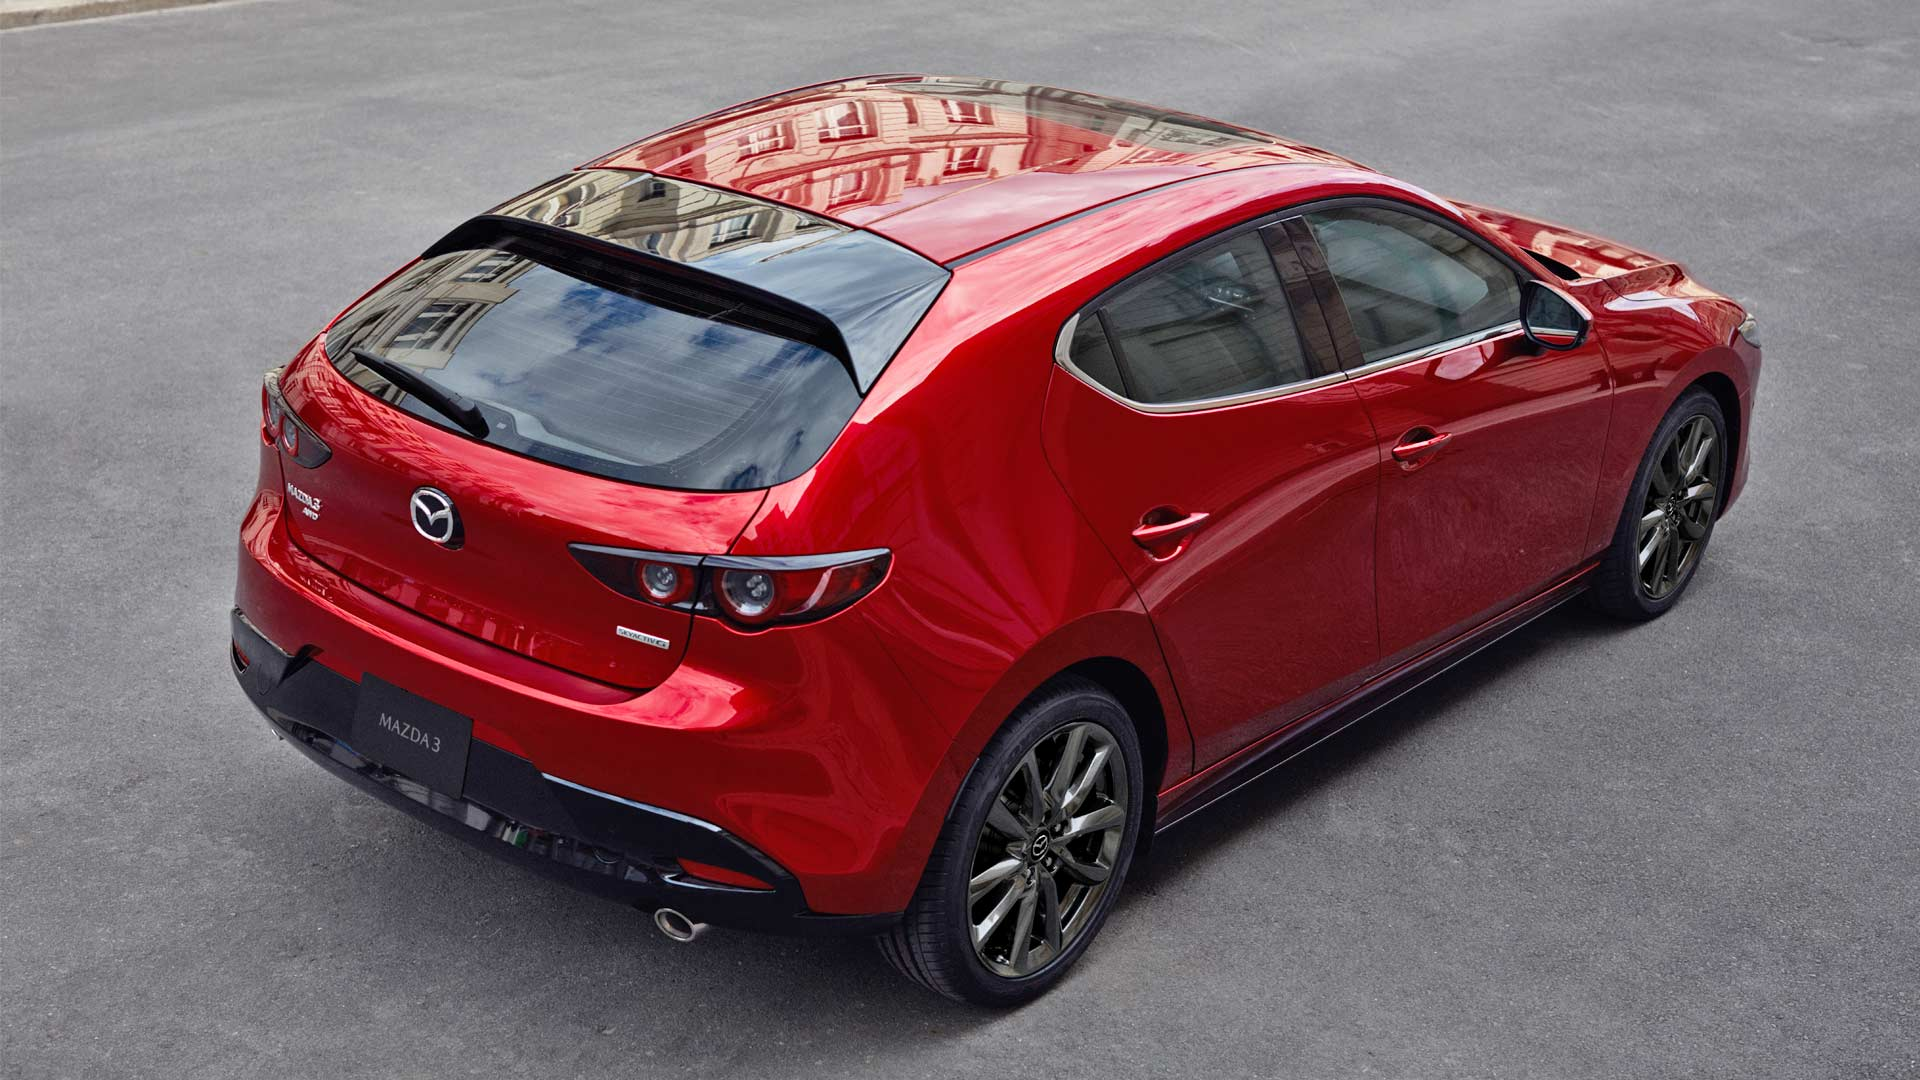 2019-Mazda-3-Hatchback_4